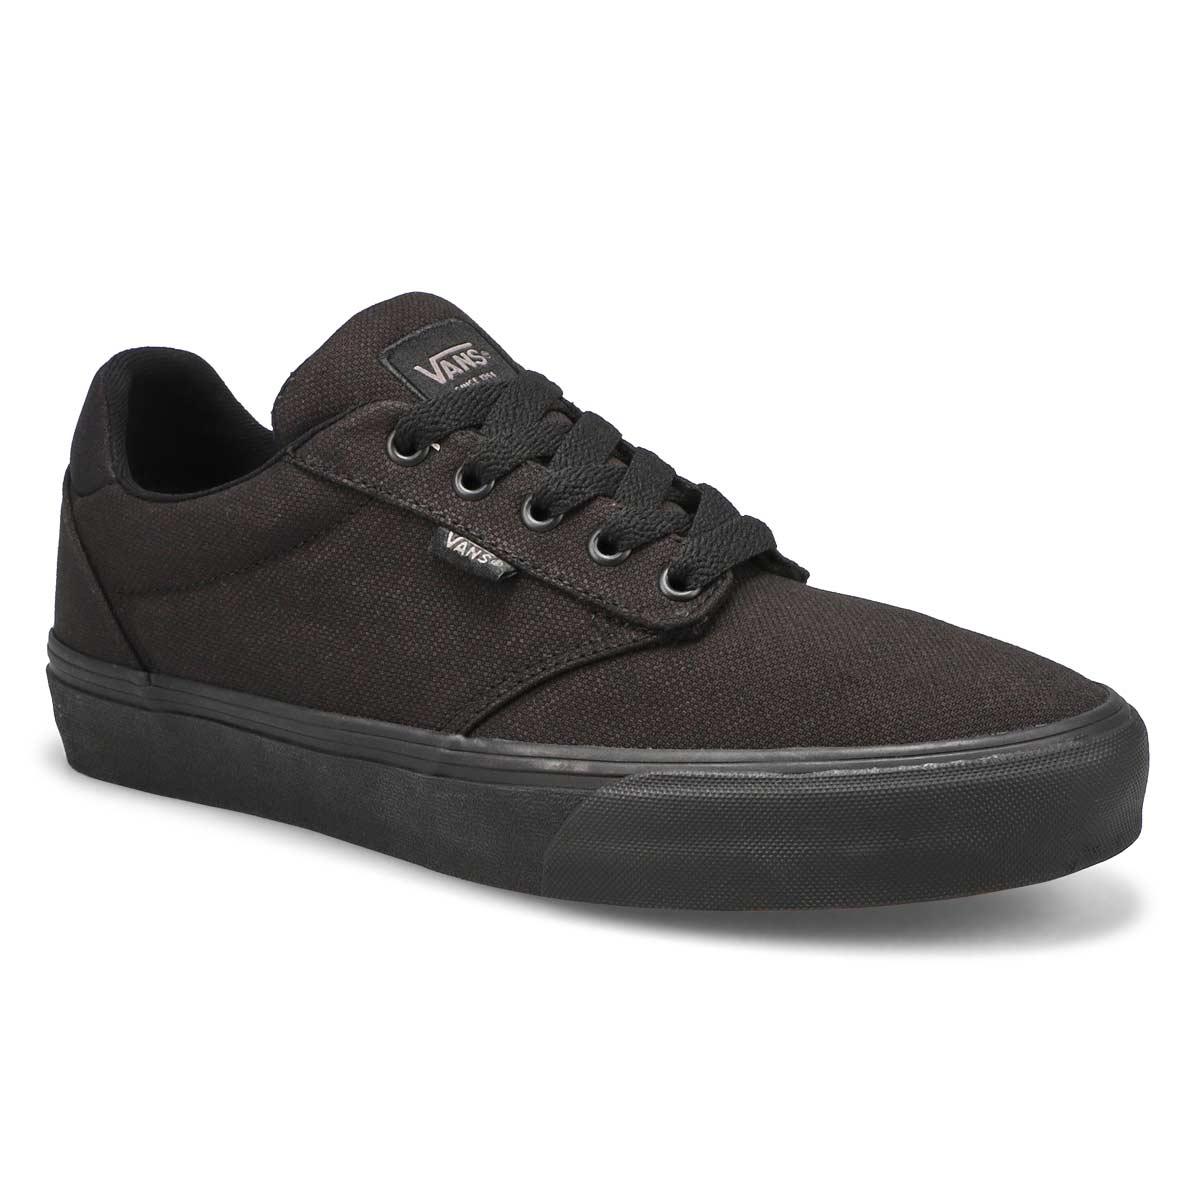 Men's Atwood Deluxe Sneaker - Black/Black